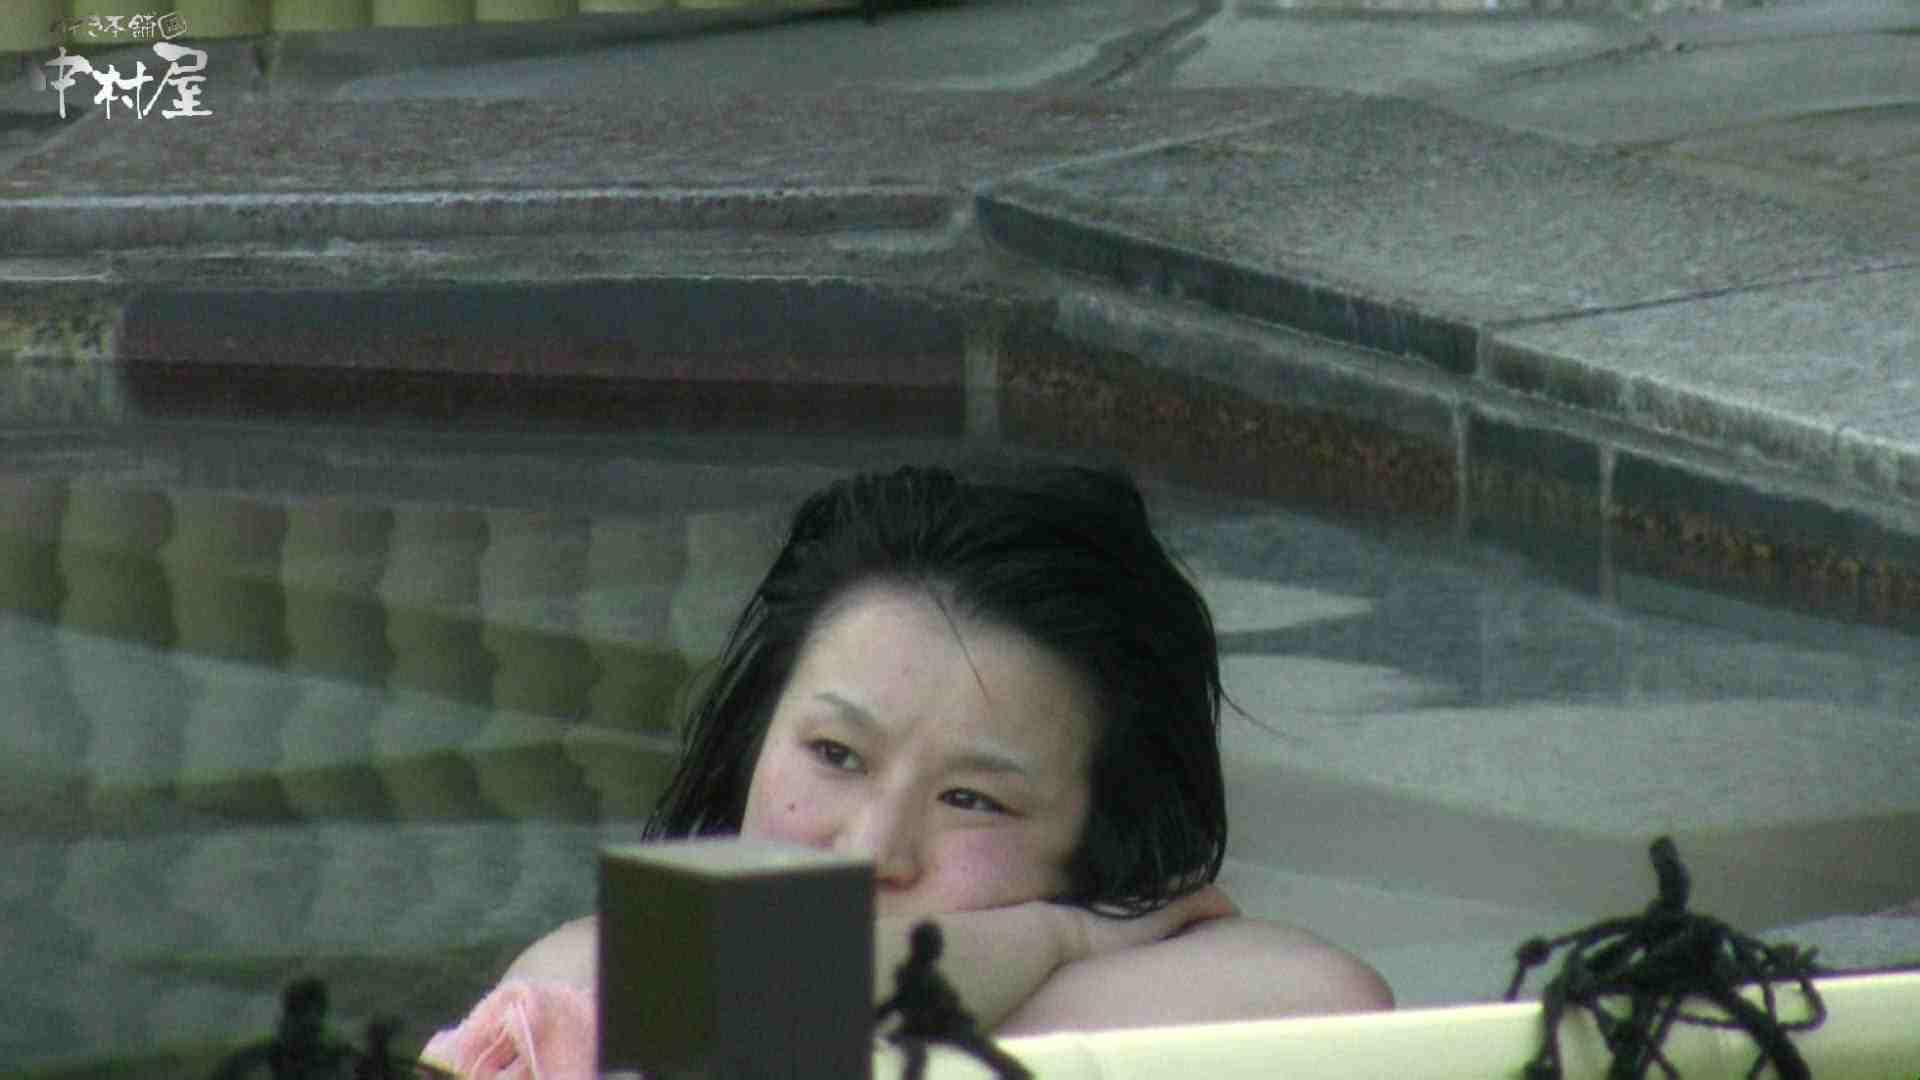 Aquaな露天風呂Vol.982 露天風呂突入 SEX無修正画像 78pic 77